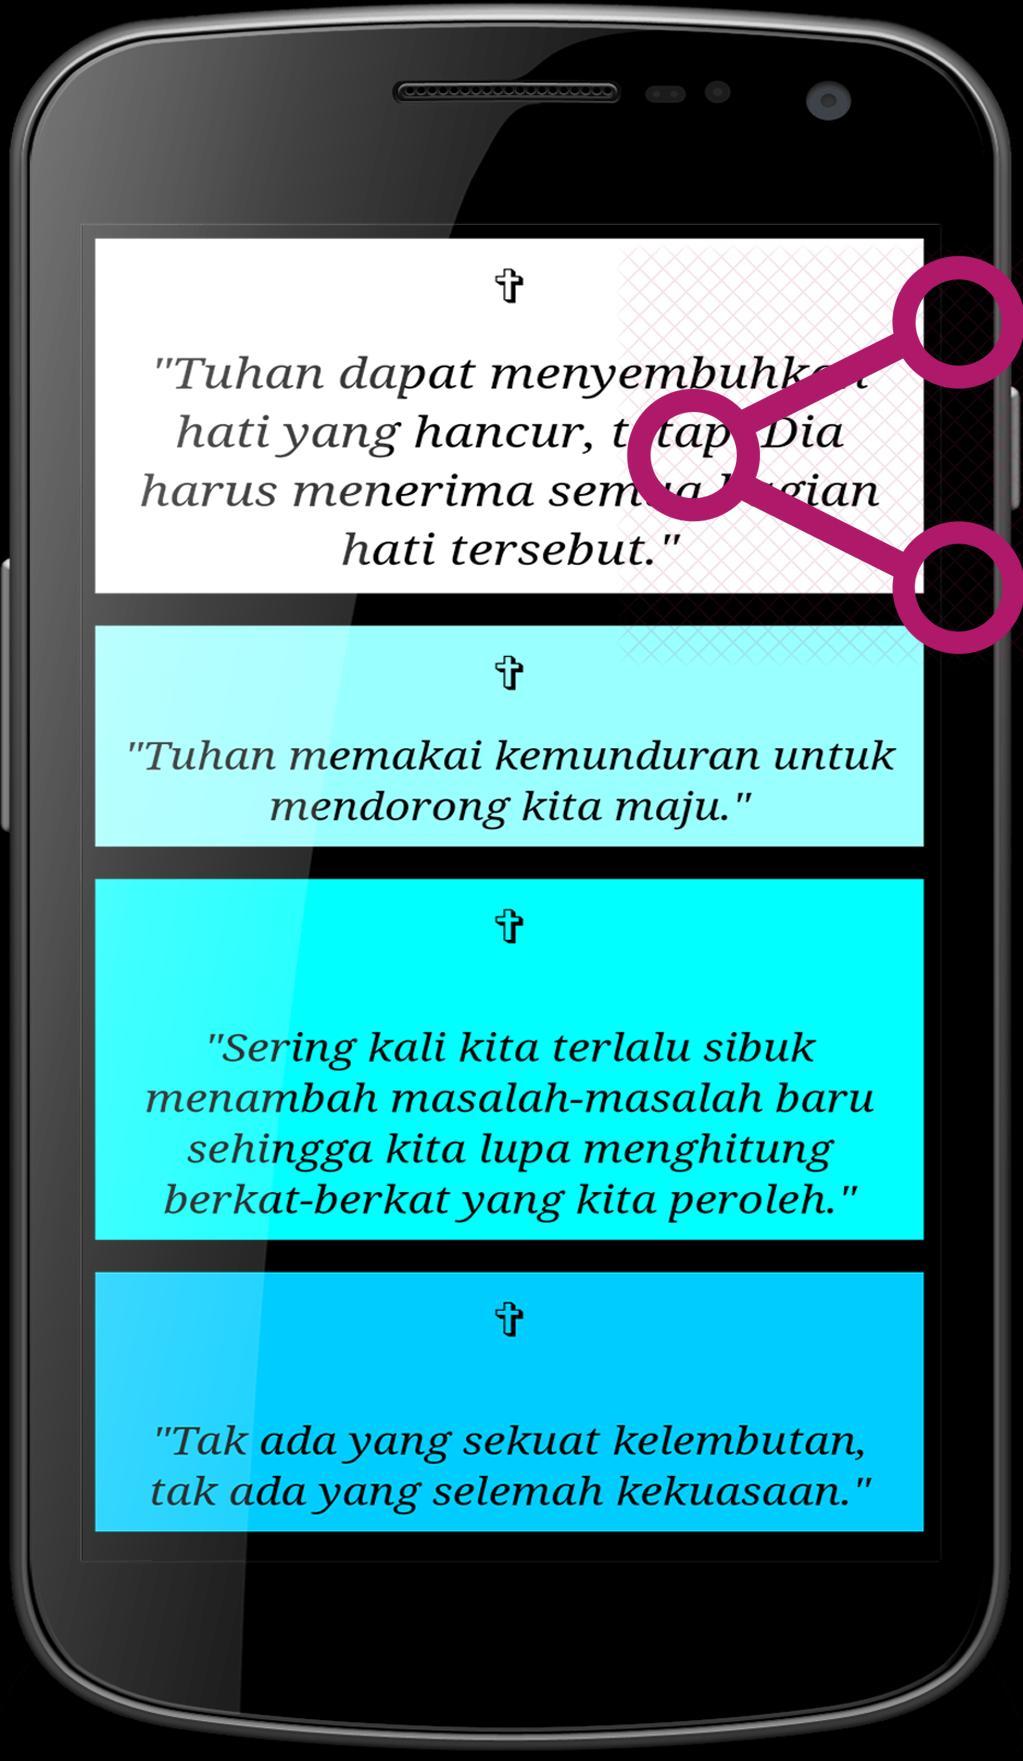 Kata Kata Bijak Terbaik Alkitab Für Android Apk Herunterladen